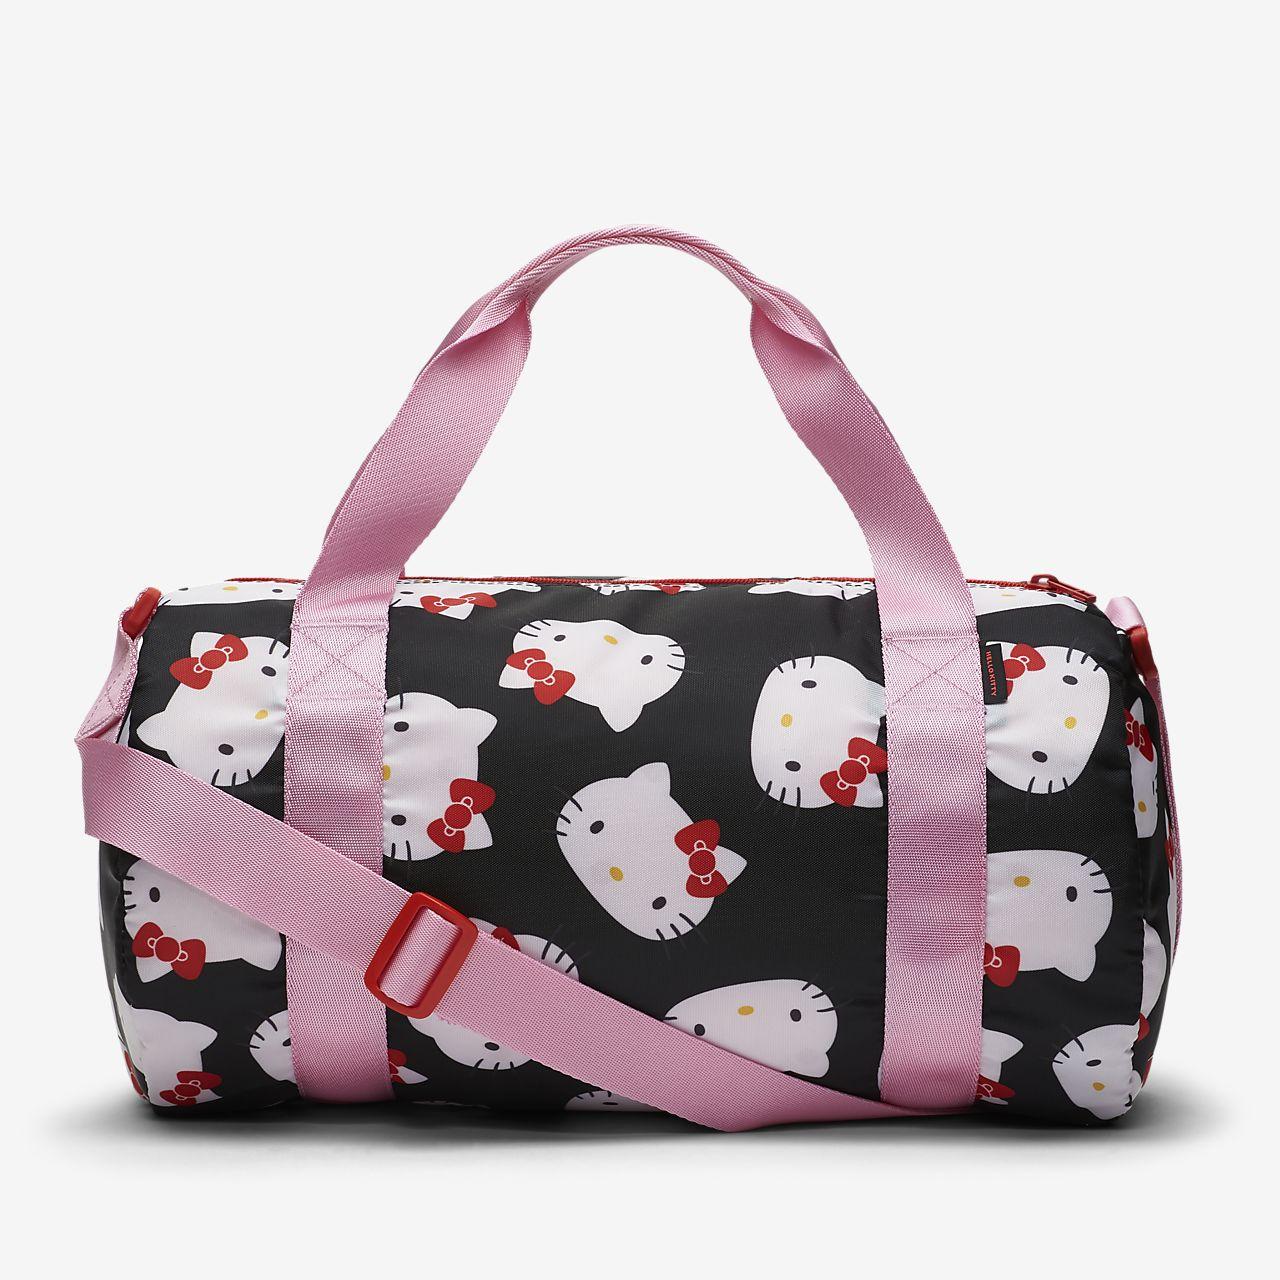 Converse x Hello Kitty Mini Unisex Duffel Bag